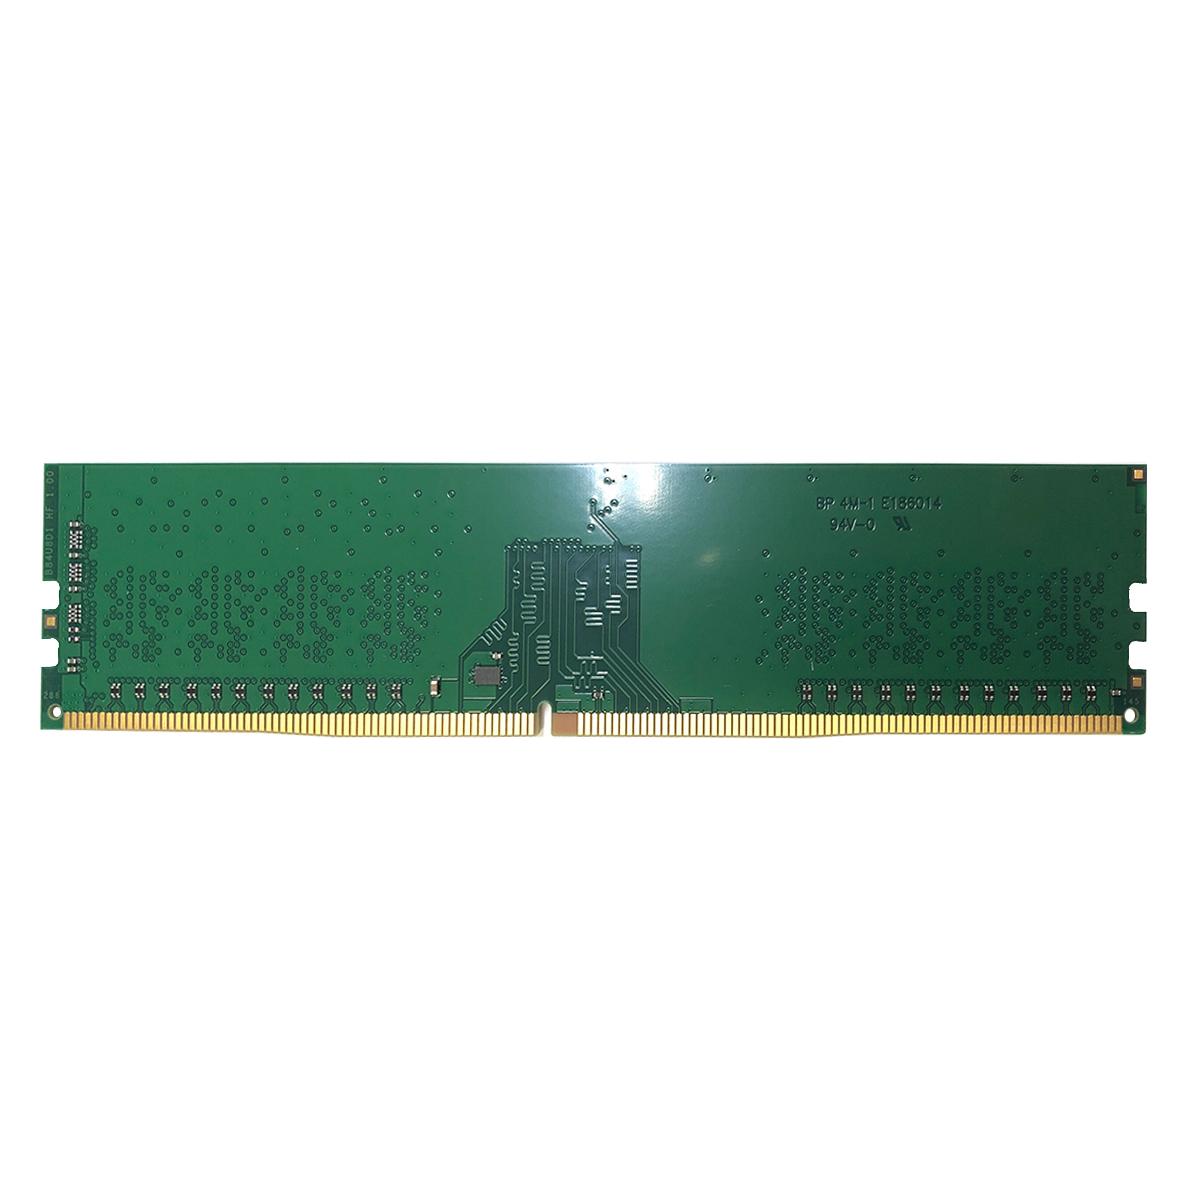 Memória Adata 8GB, DDR4, 2400MHz, CL17 - AD4U240038G17-S